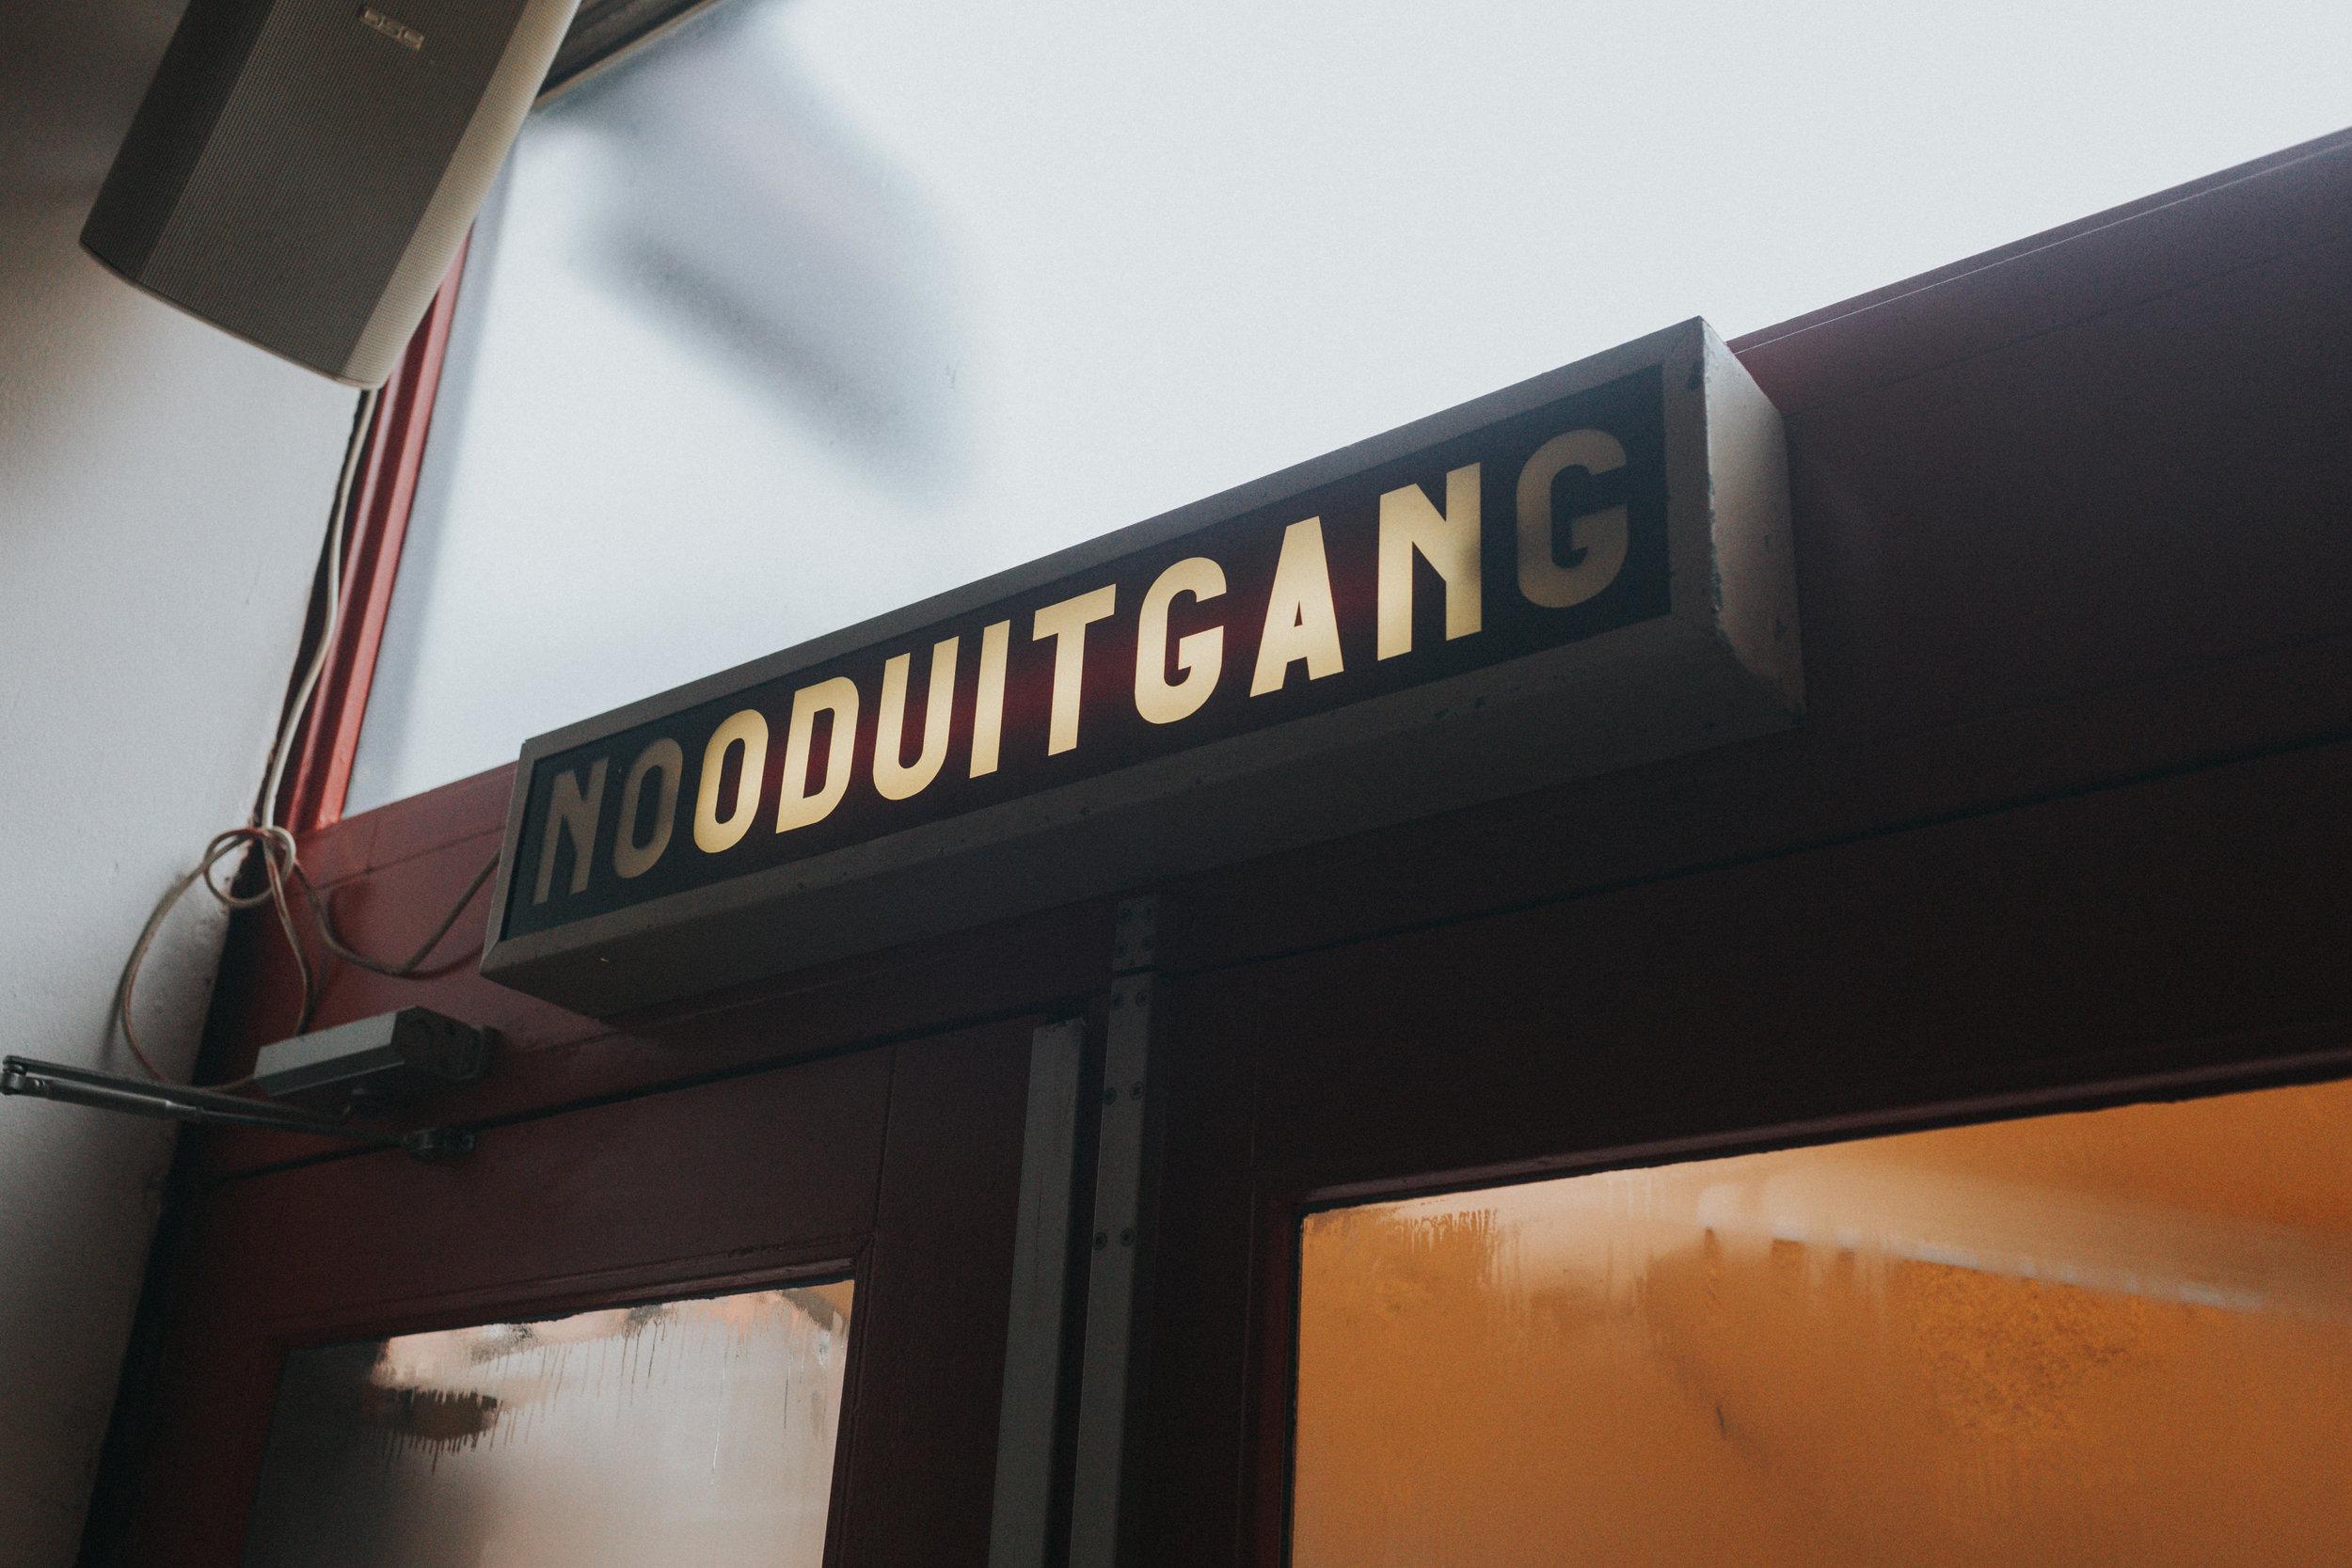 nooduitgang / emergency exit